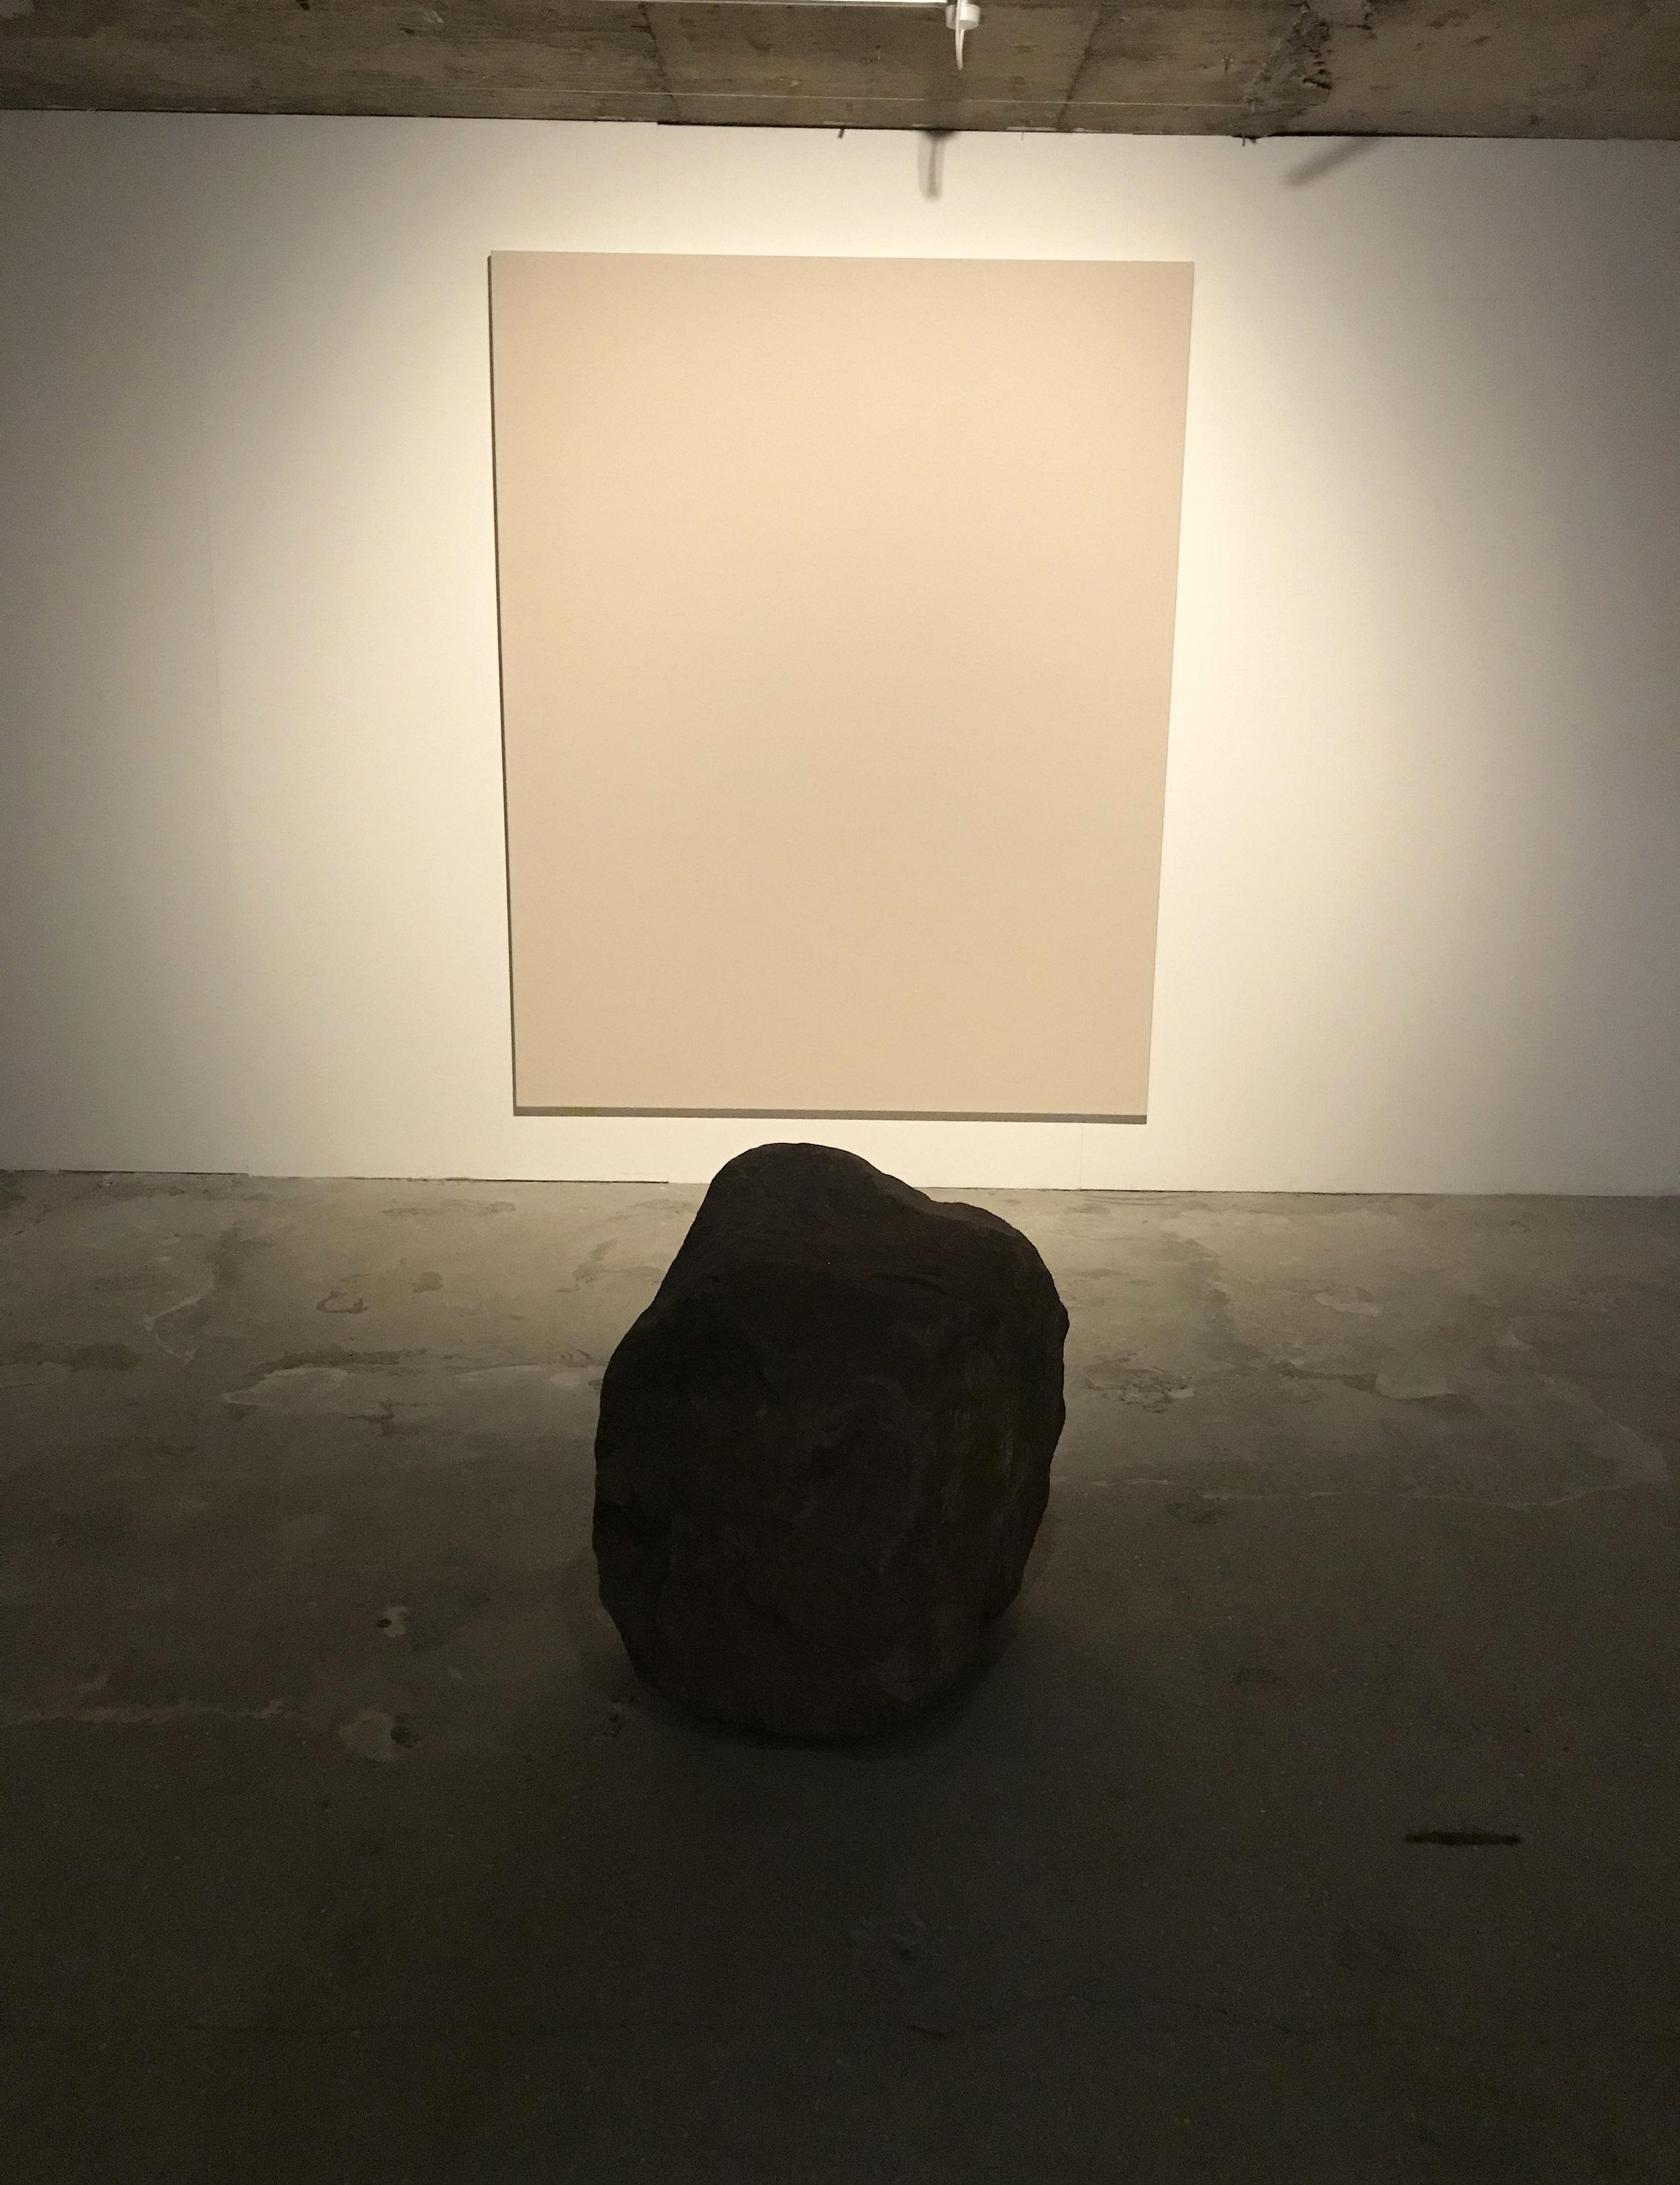 Lee Ufan: Dialogue – Silence (2013)